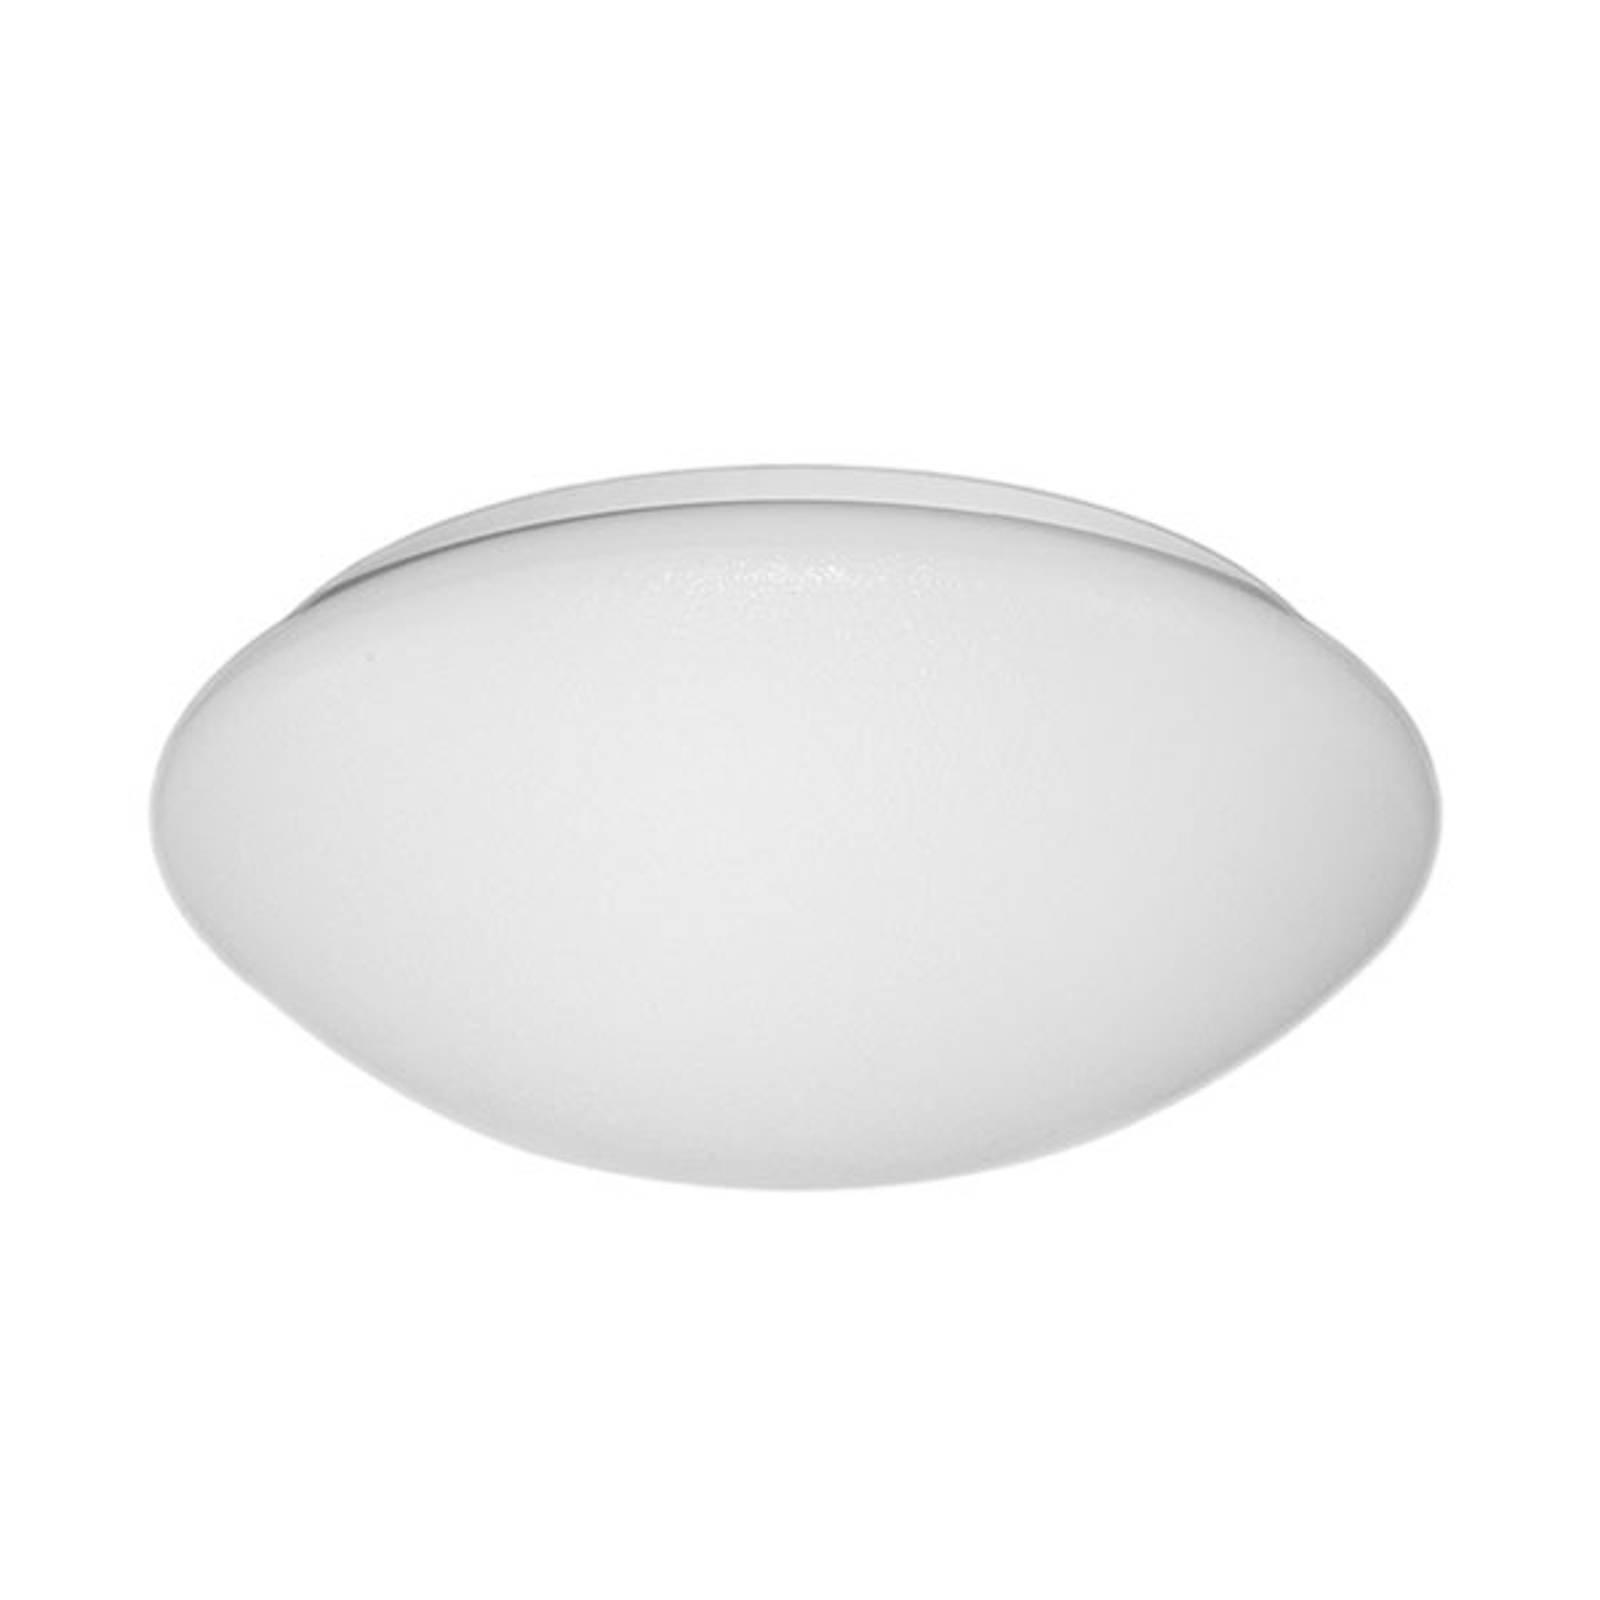 LED-taklampe, bruddsikker, 27 W, 3 000 K